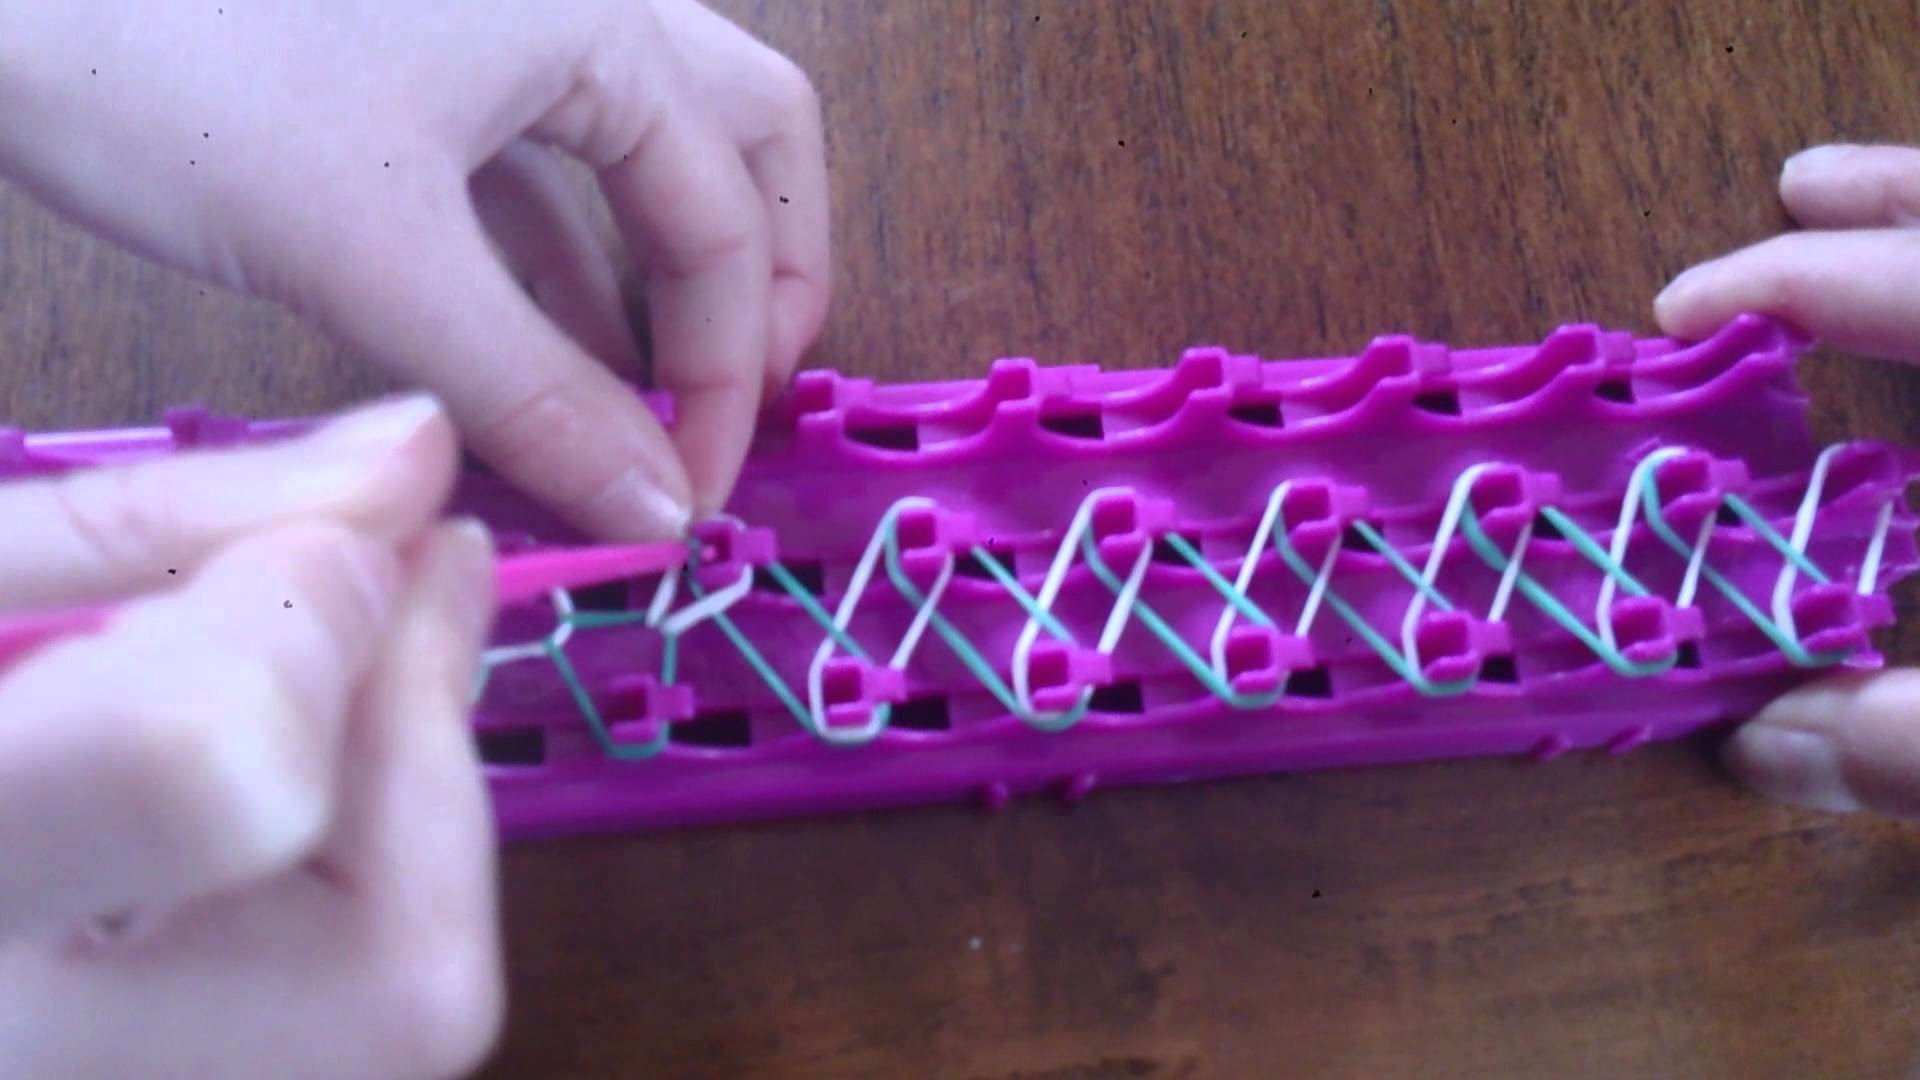 Bracelet simple cra-Z-loom